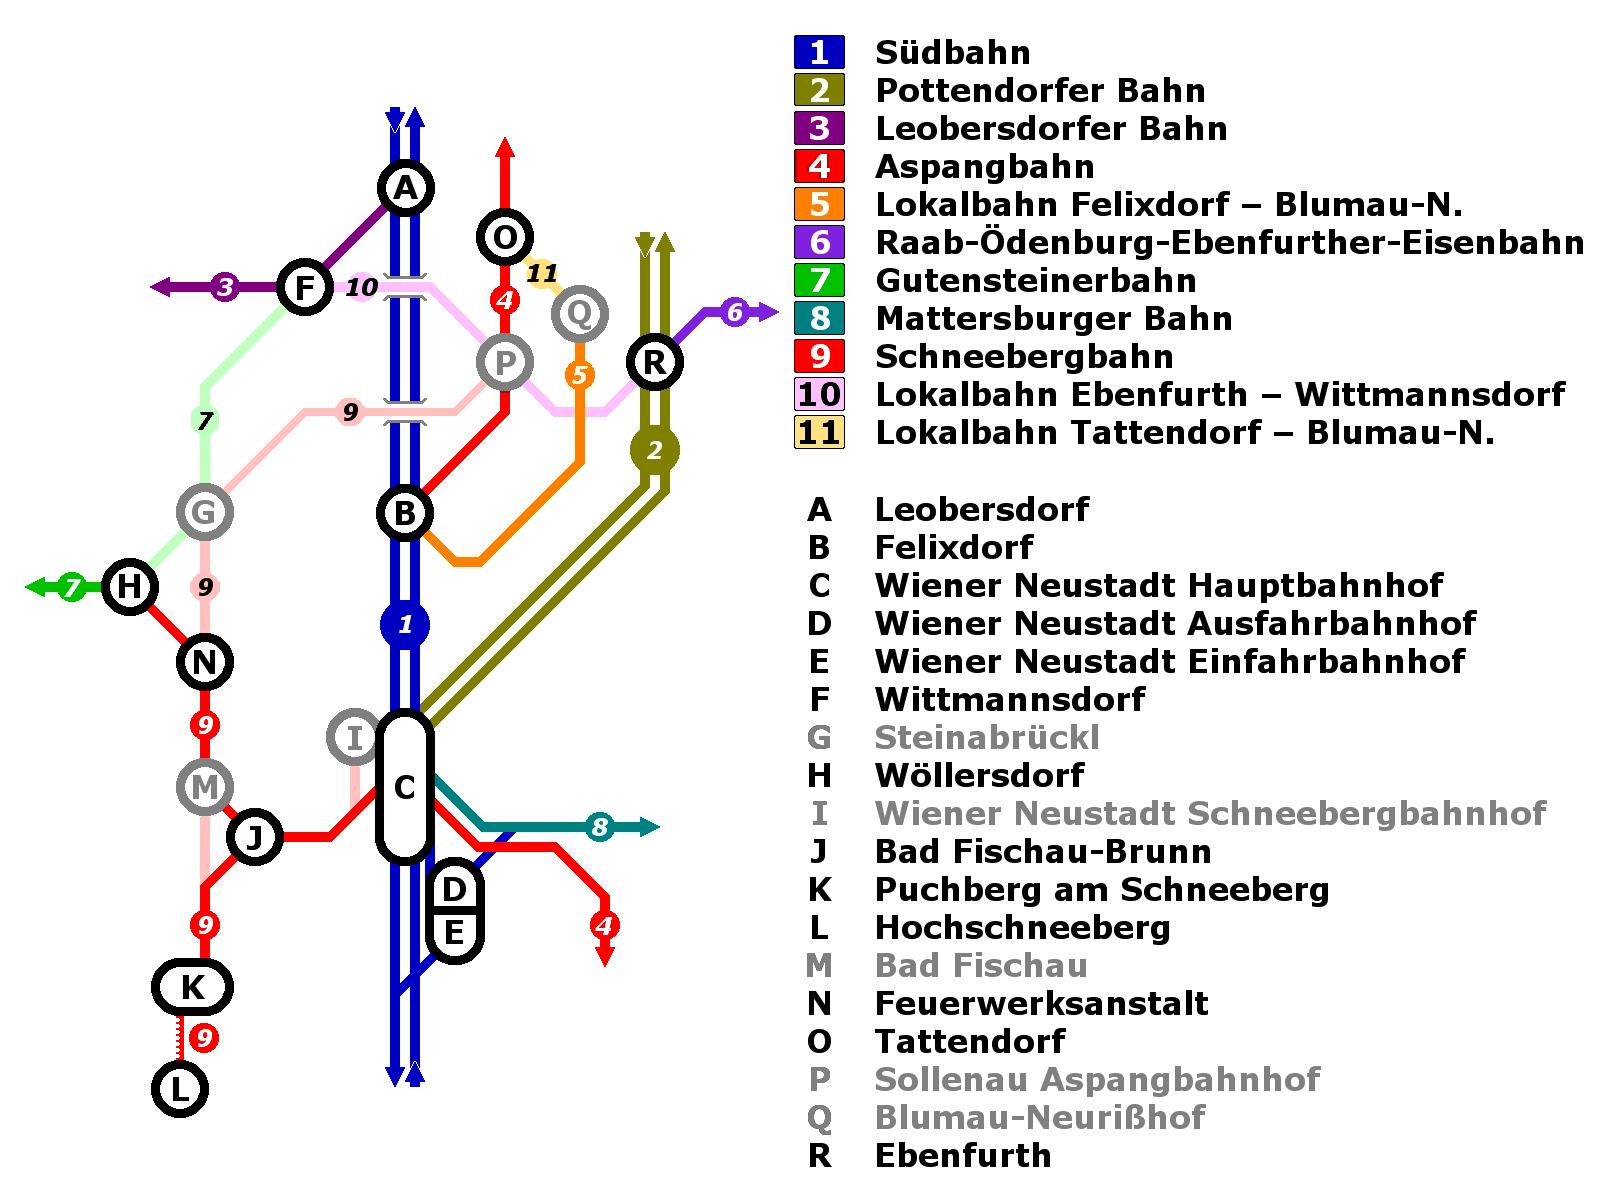 Escort Ebenfurth Gratis - Single Club In Arnoldstein